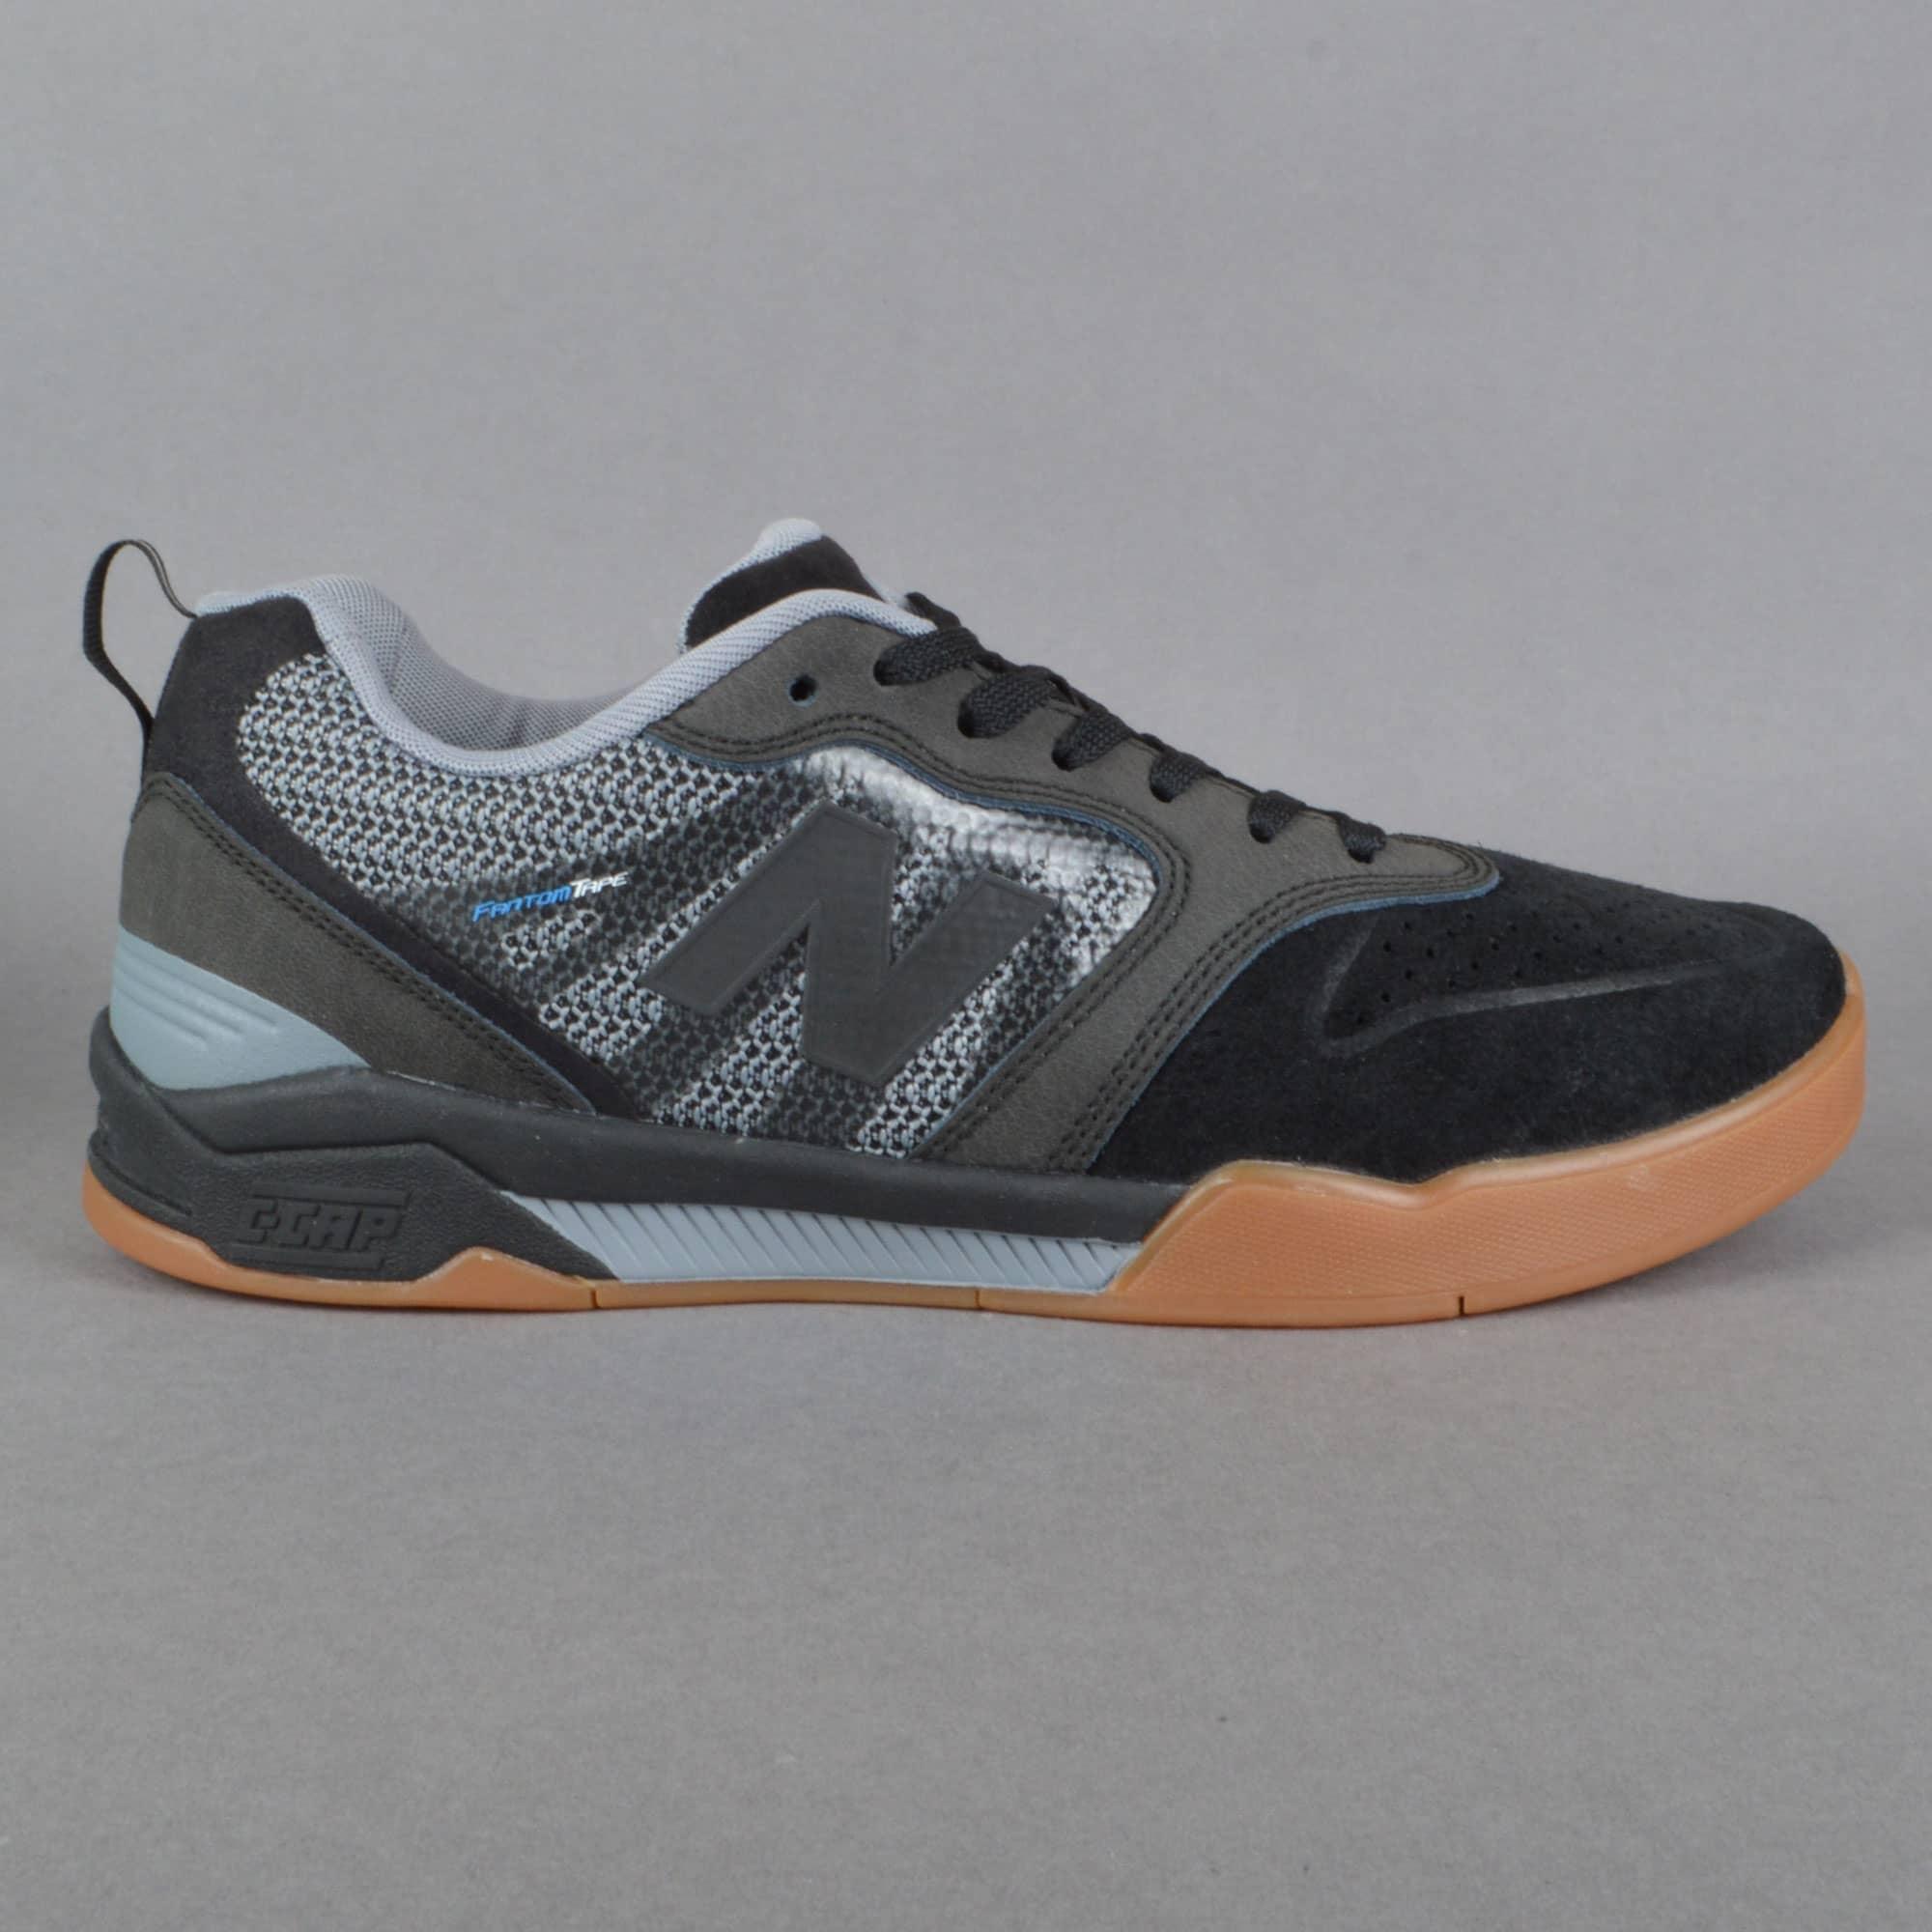 Do New Balance Trail Shoes Run Small